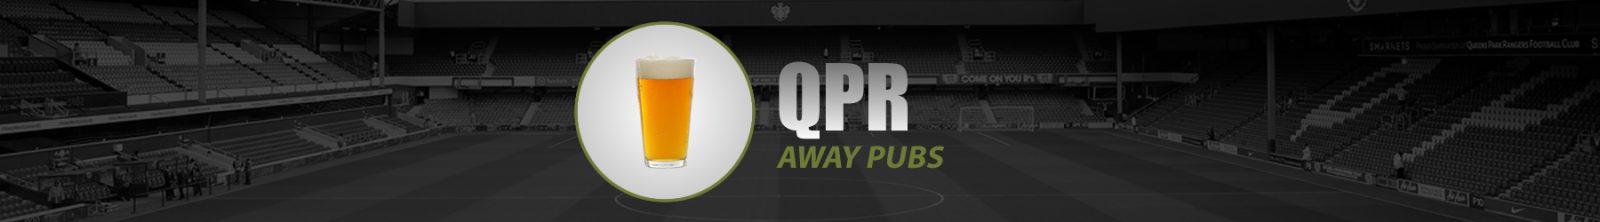 QPR Away Pubs